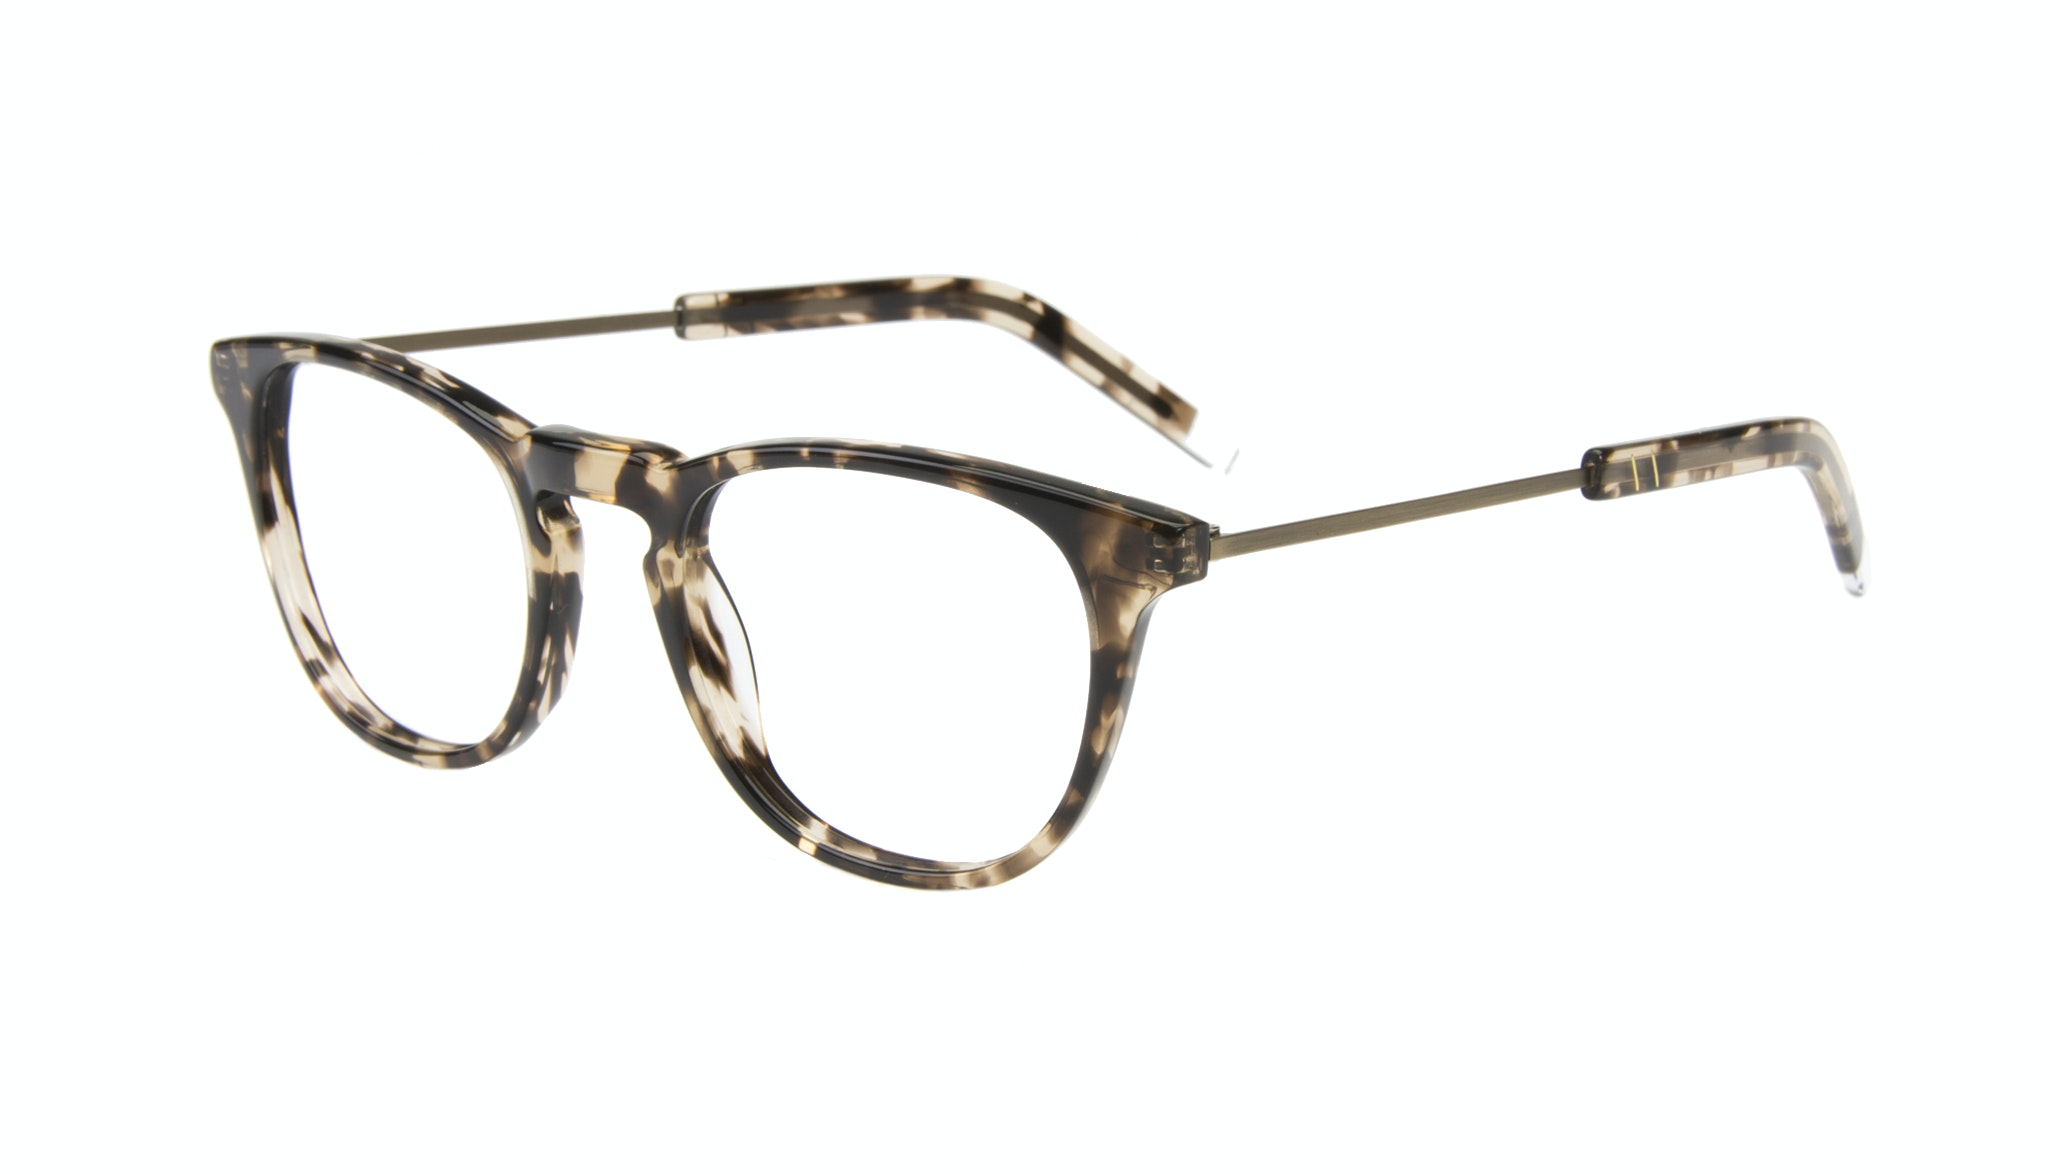 Affordable Fashion Glasses Rectangle Square Eyeglasses Men Sturdy Gold Tort Tilt